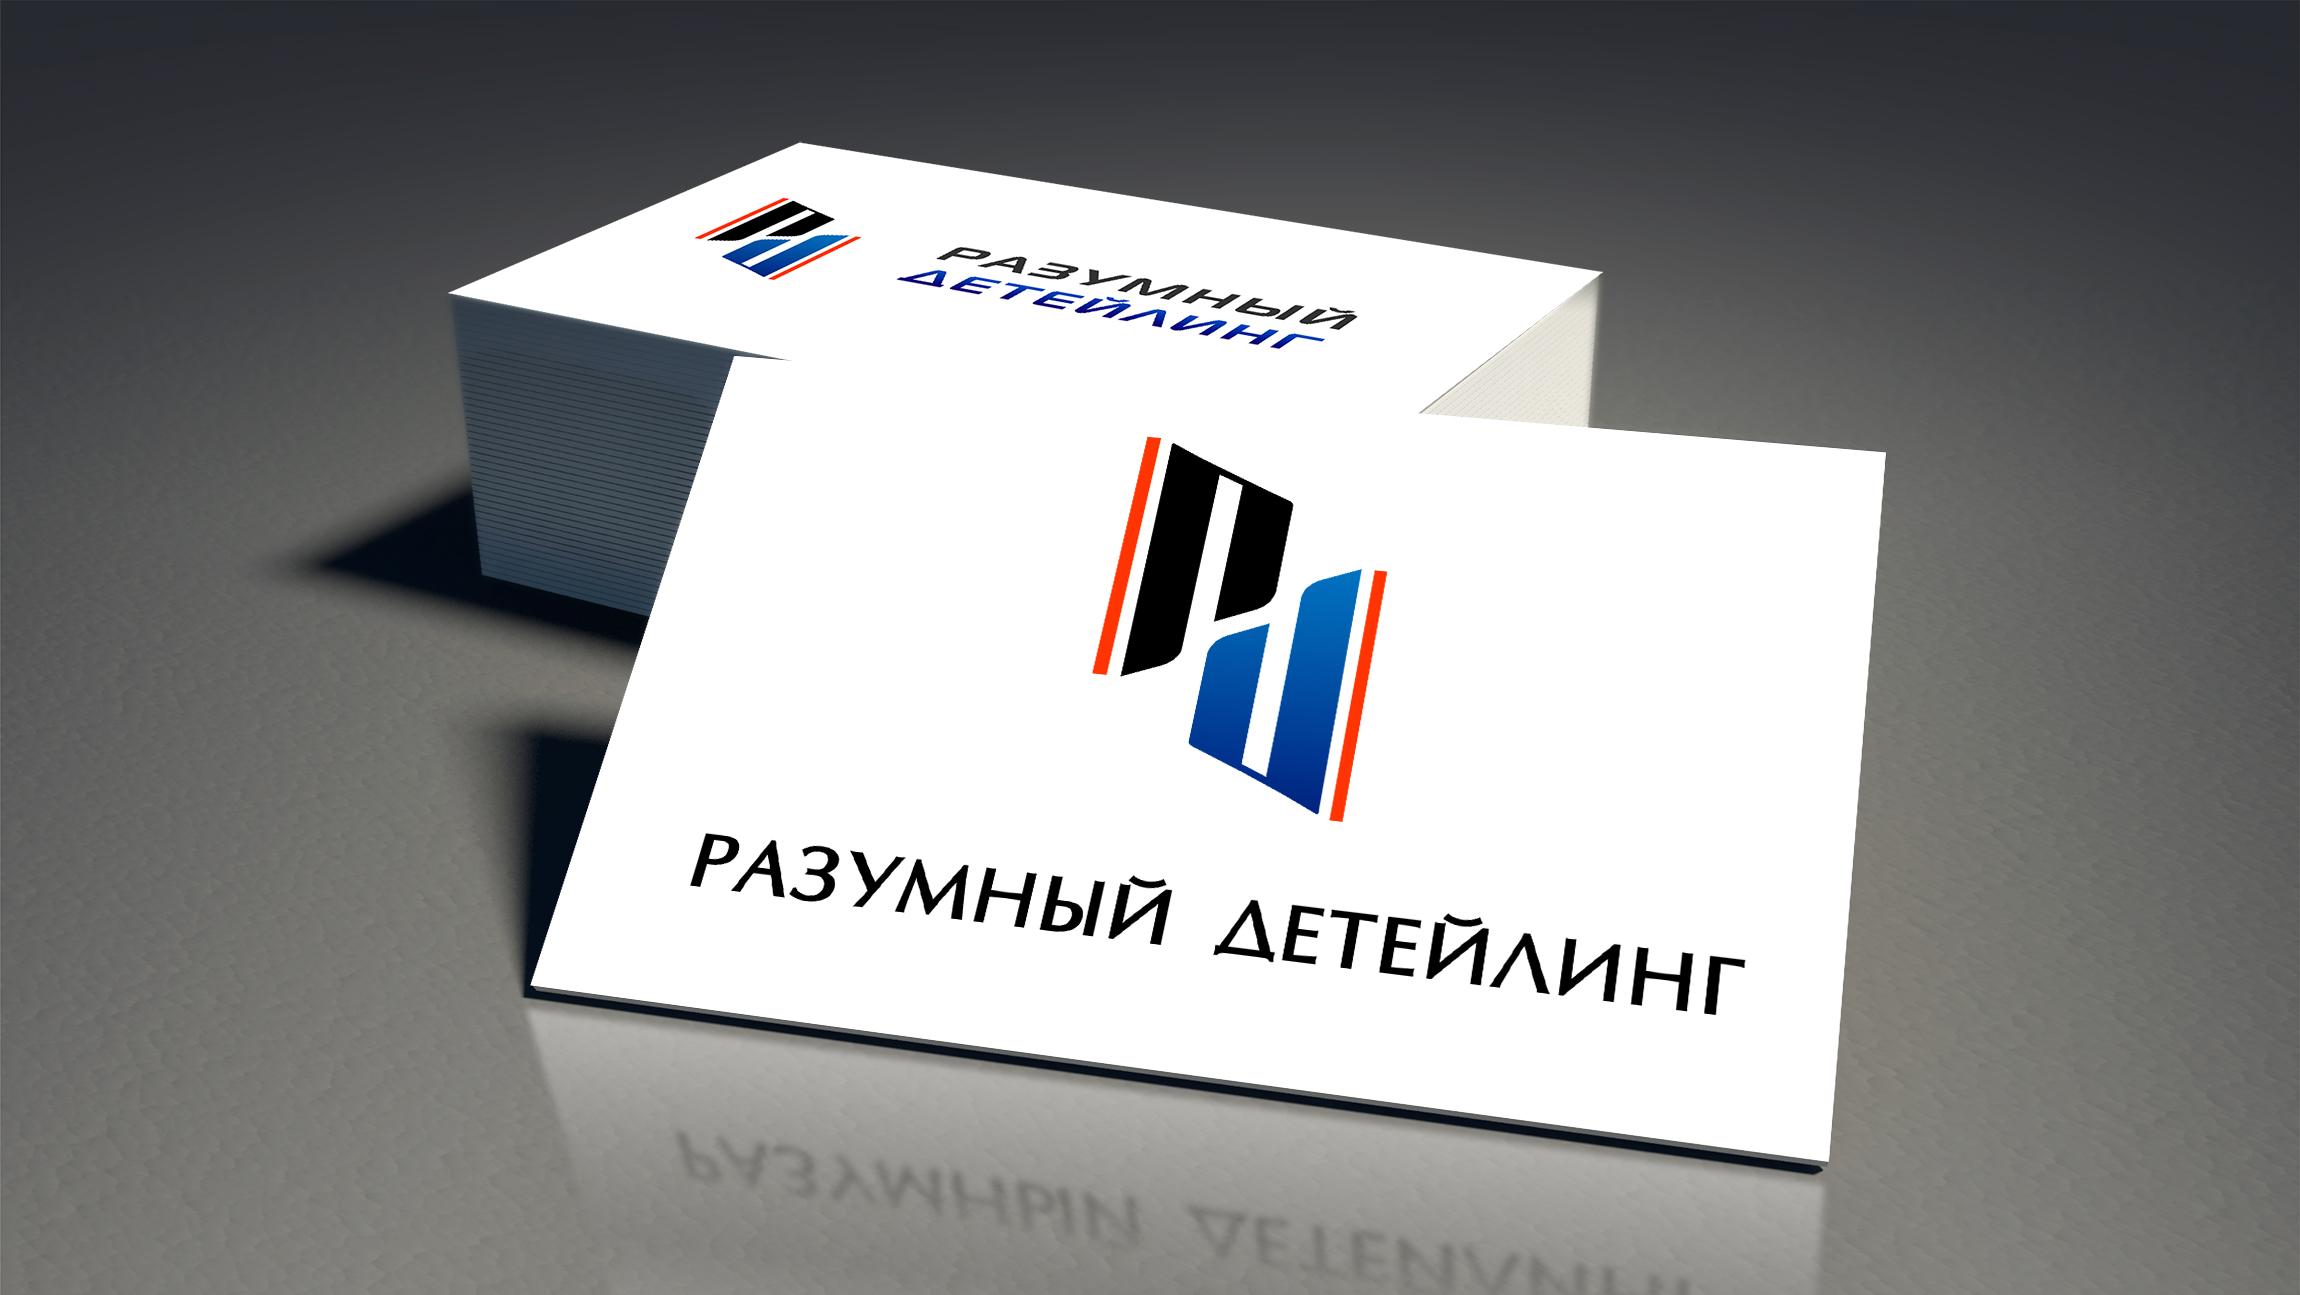 Ребрендинг логотипа  фото f_8515aef68537a6b4.jpg